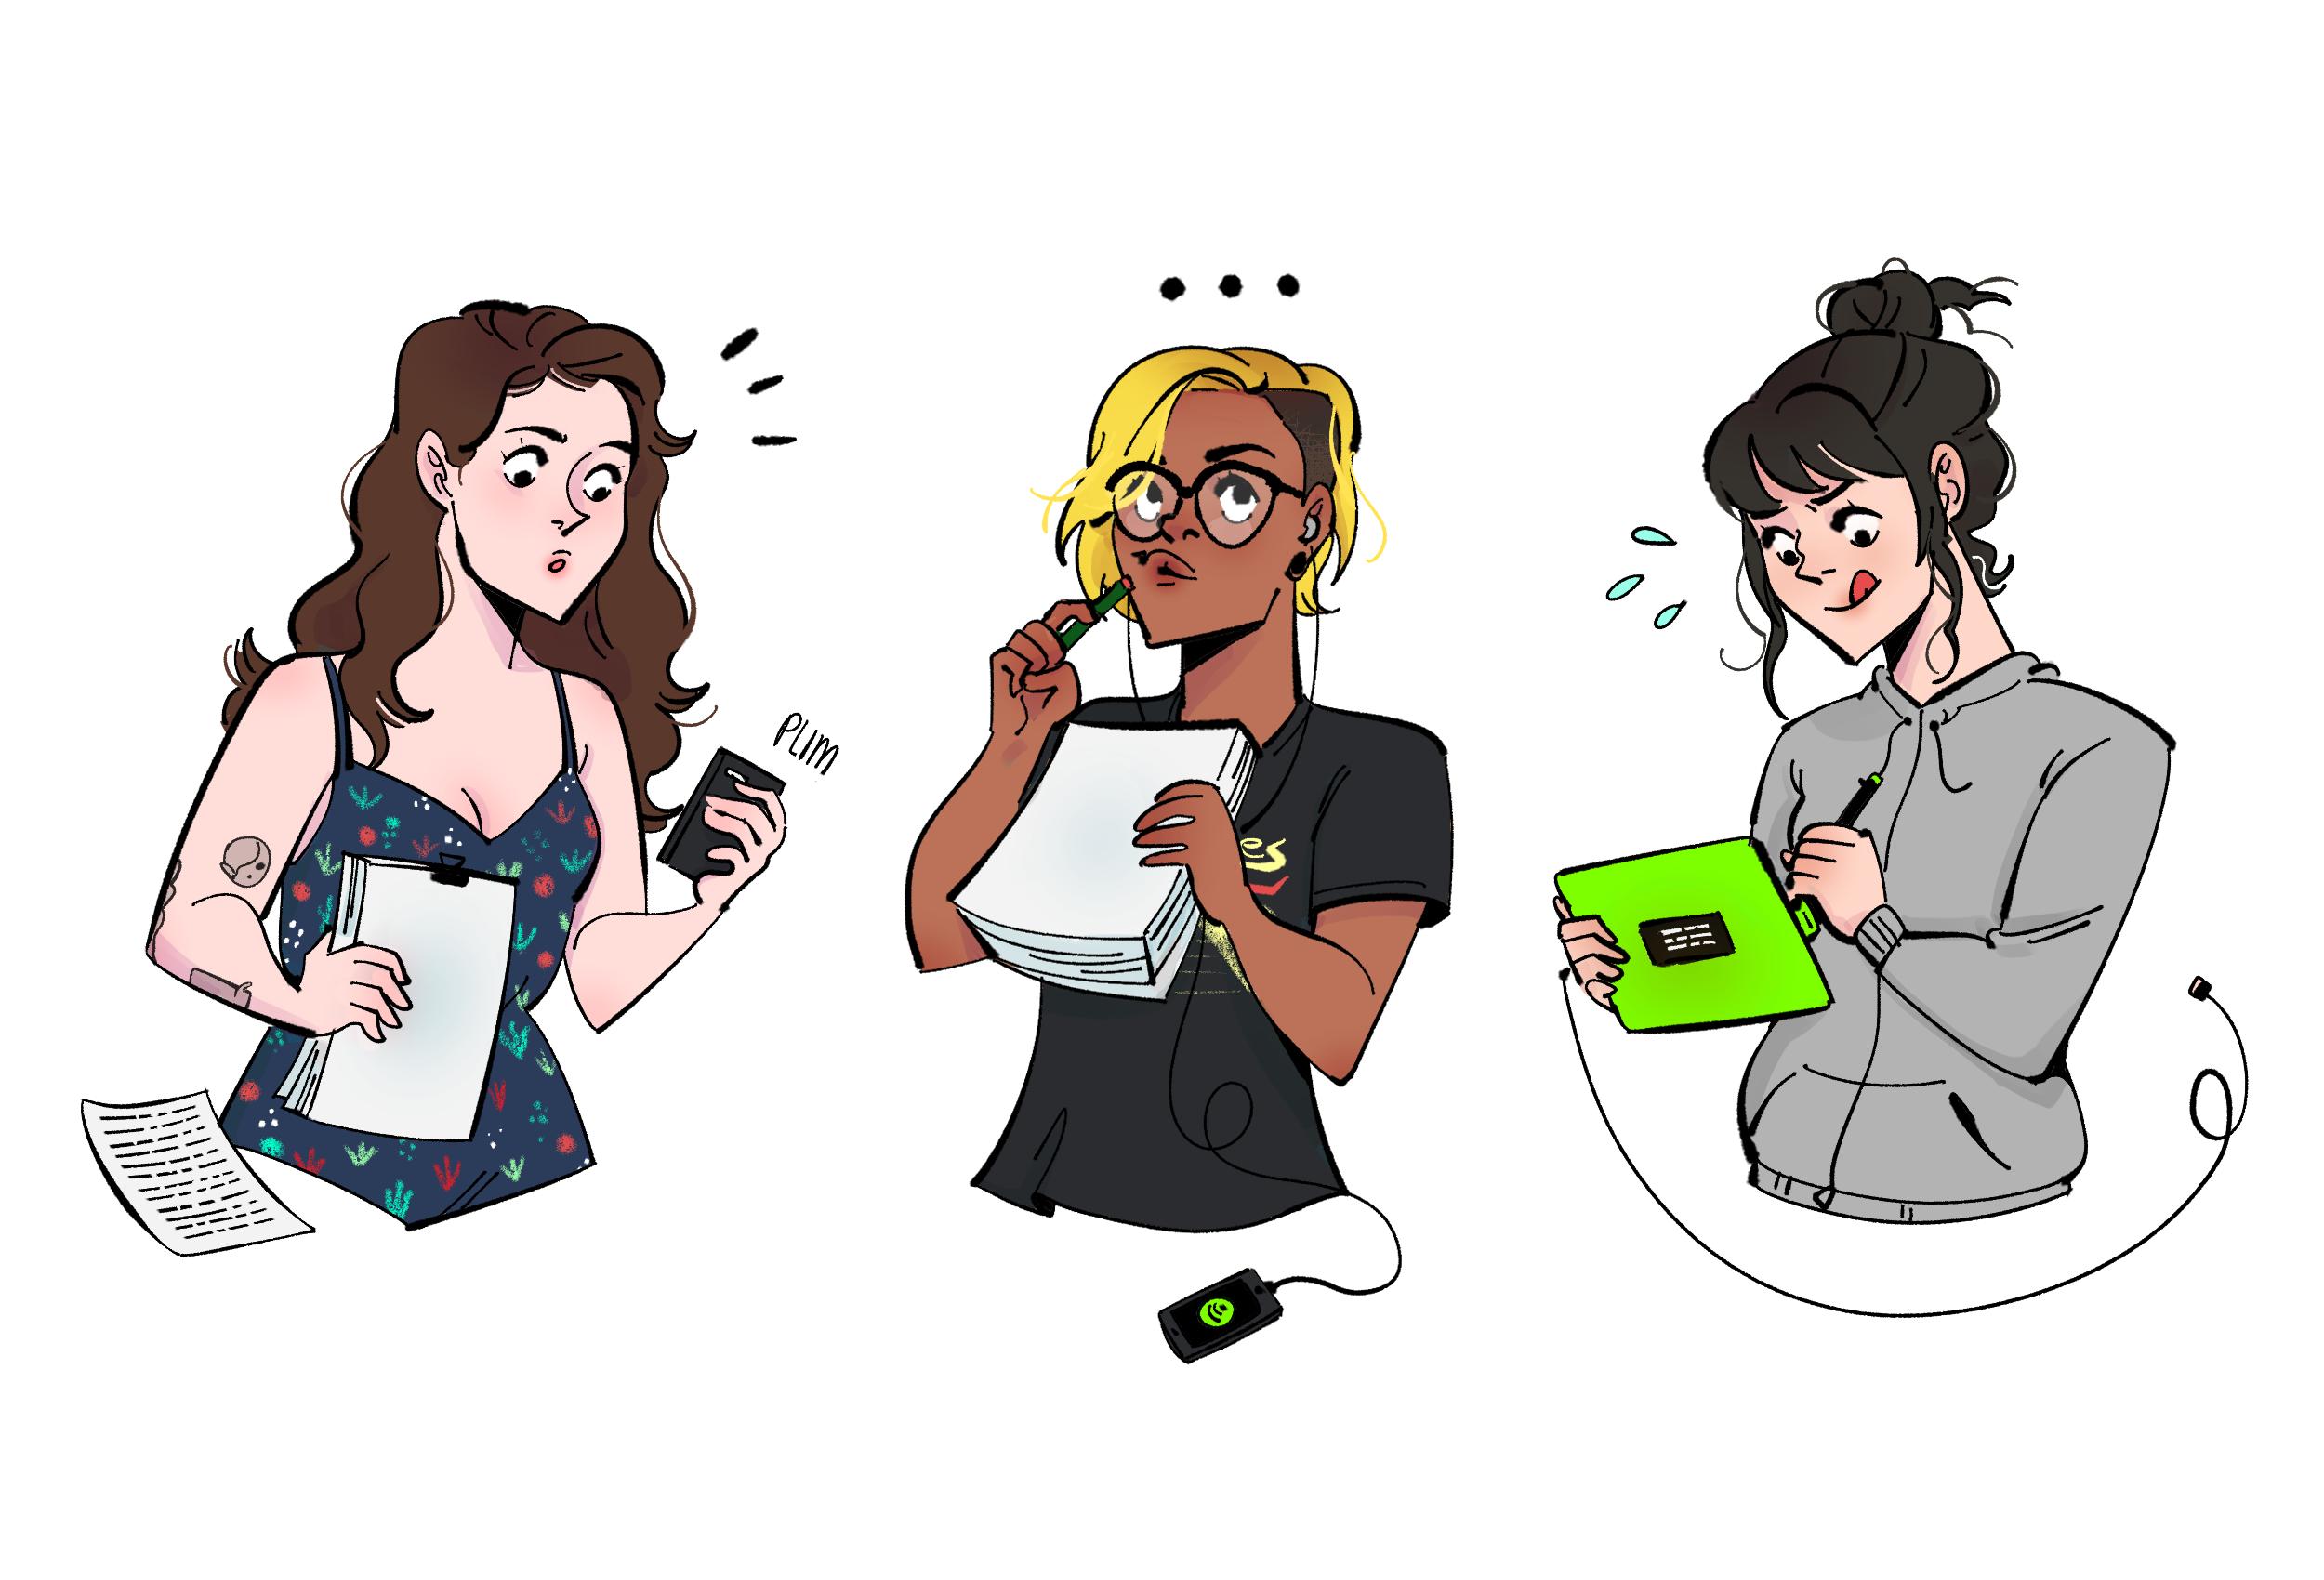 Follow the creators online for updates about the project:  Stephanie ( @hellocookie ) / Insha ( @benwyatt ) / Juliana ( @notjulianamoon )